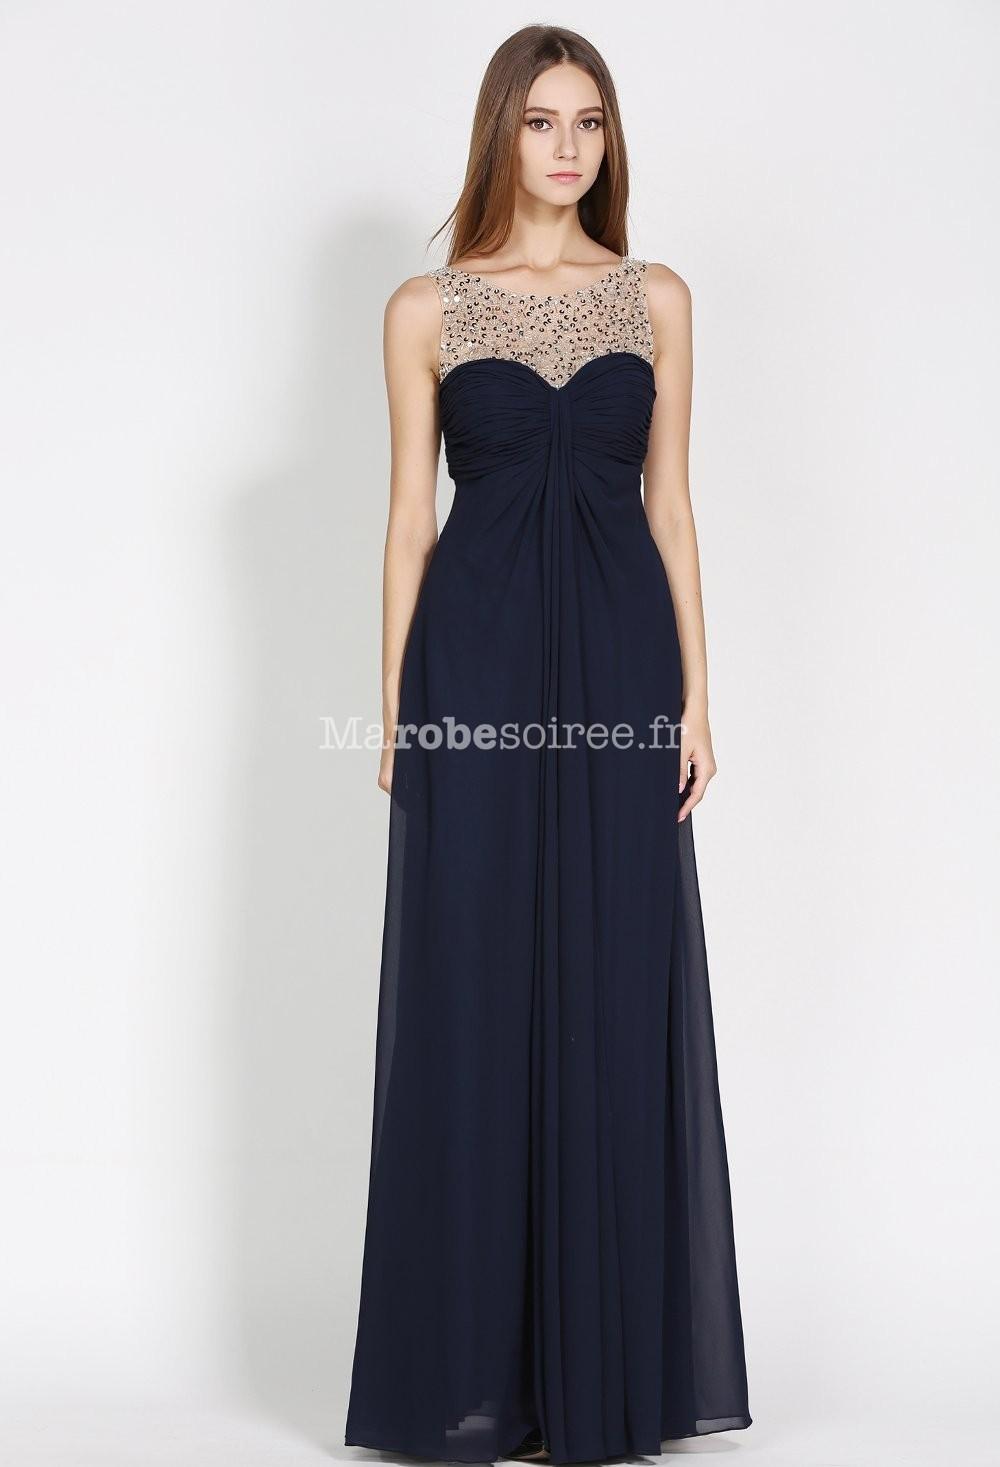 robe de c r monie bleu marine d collet transparent orn de strass. Black Bedroom Furniture Sets. Home Design Ideas